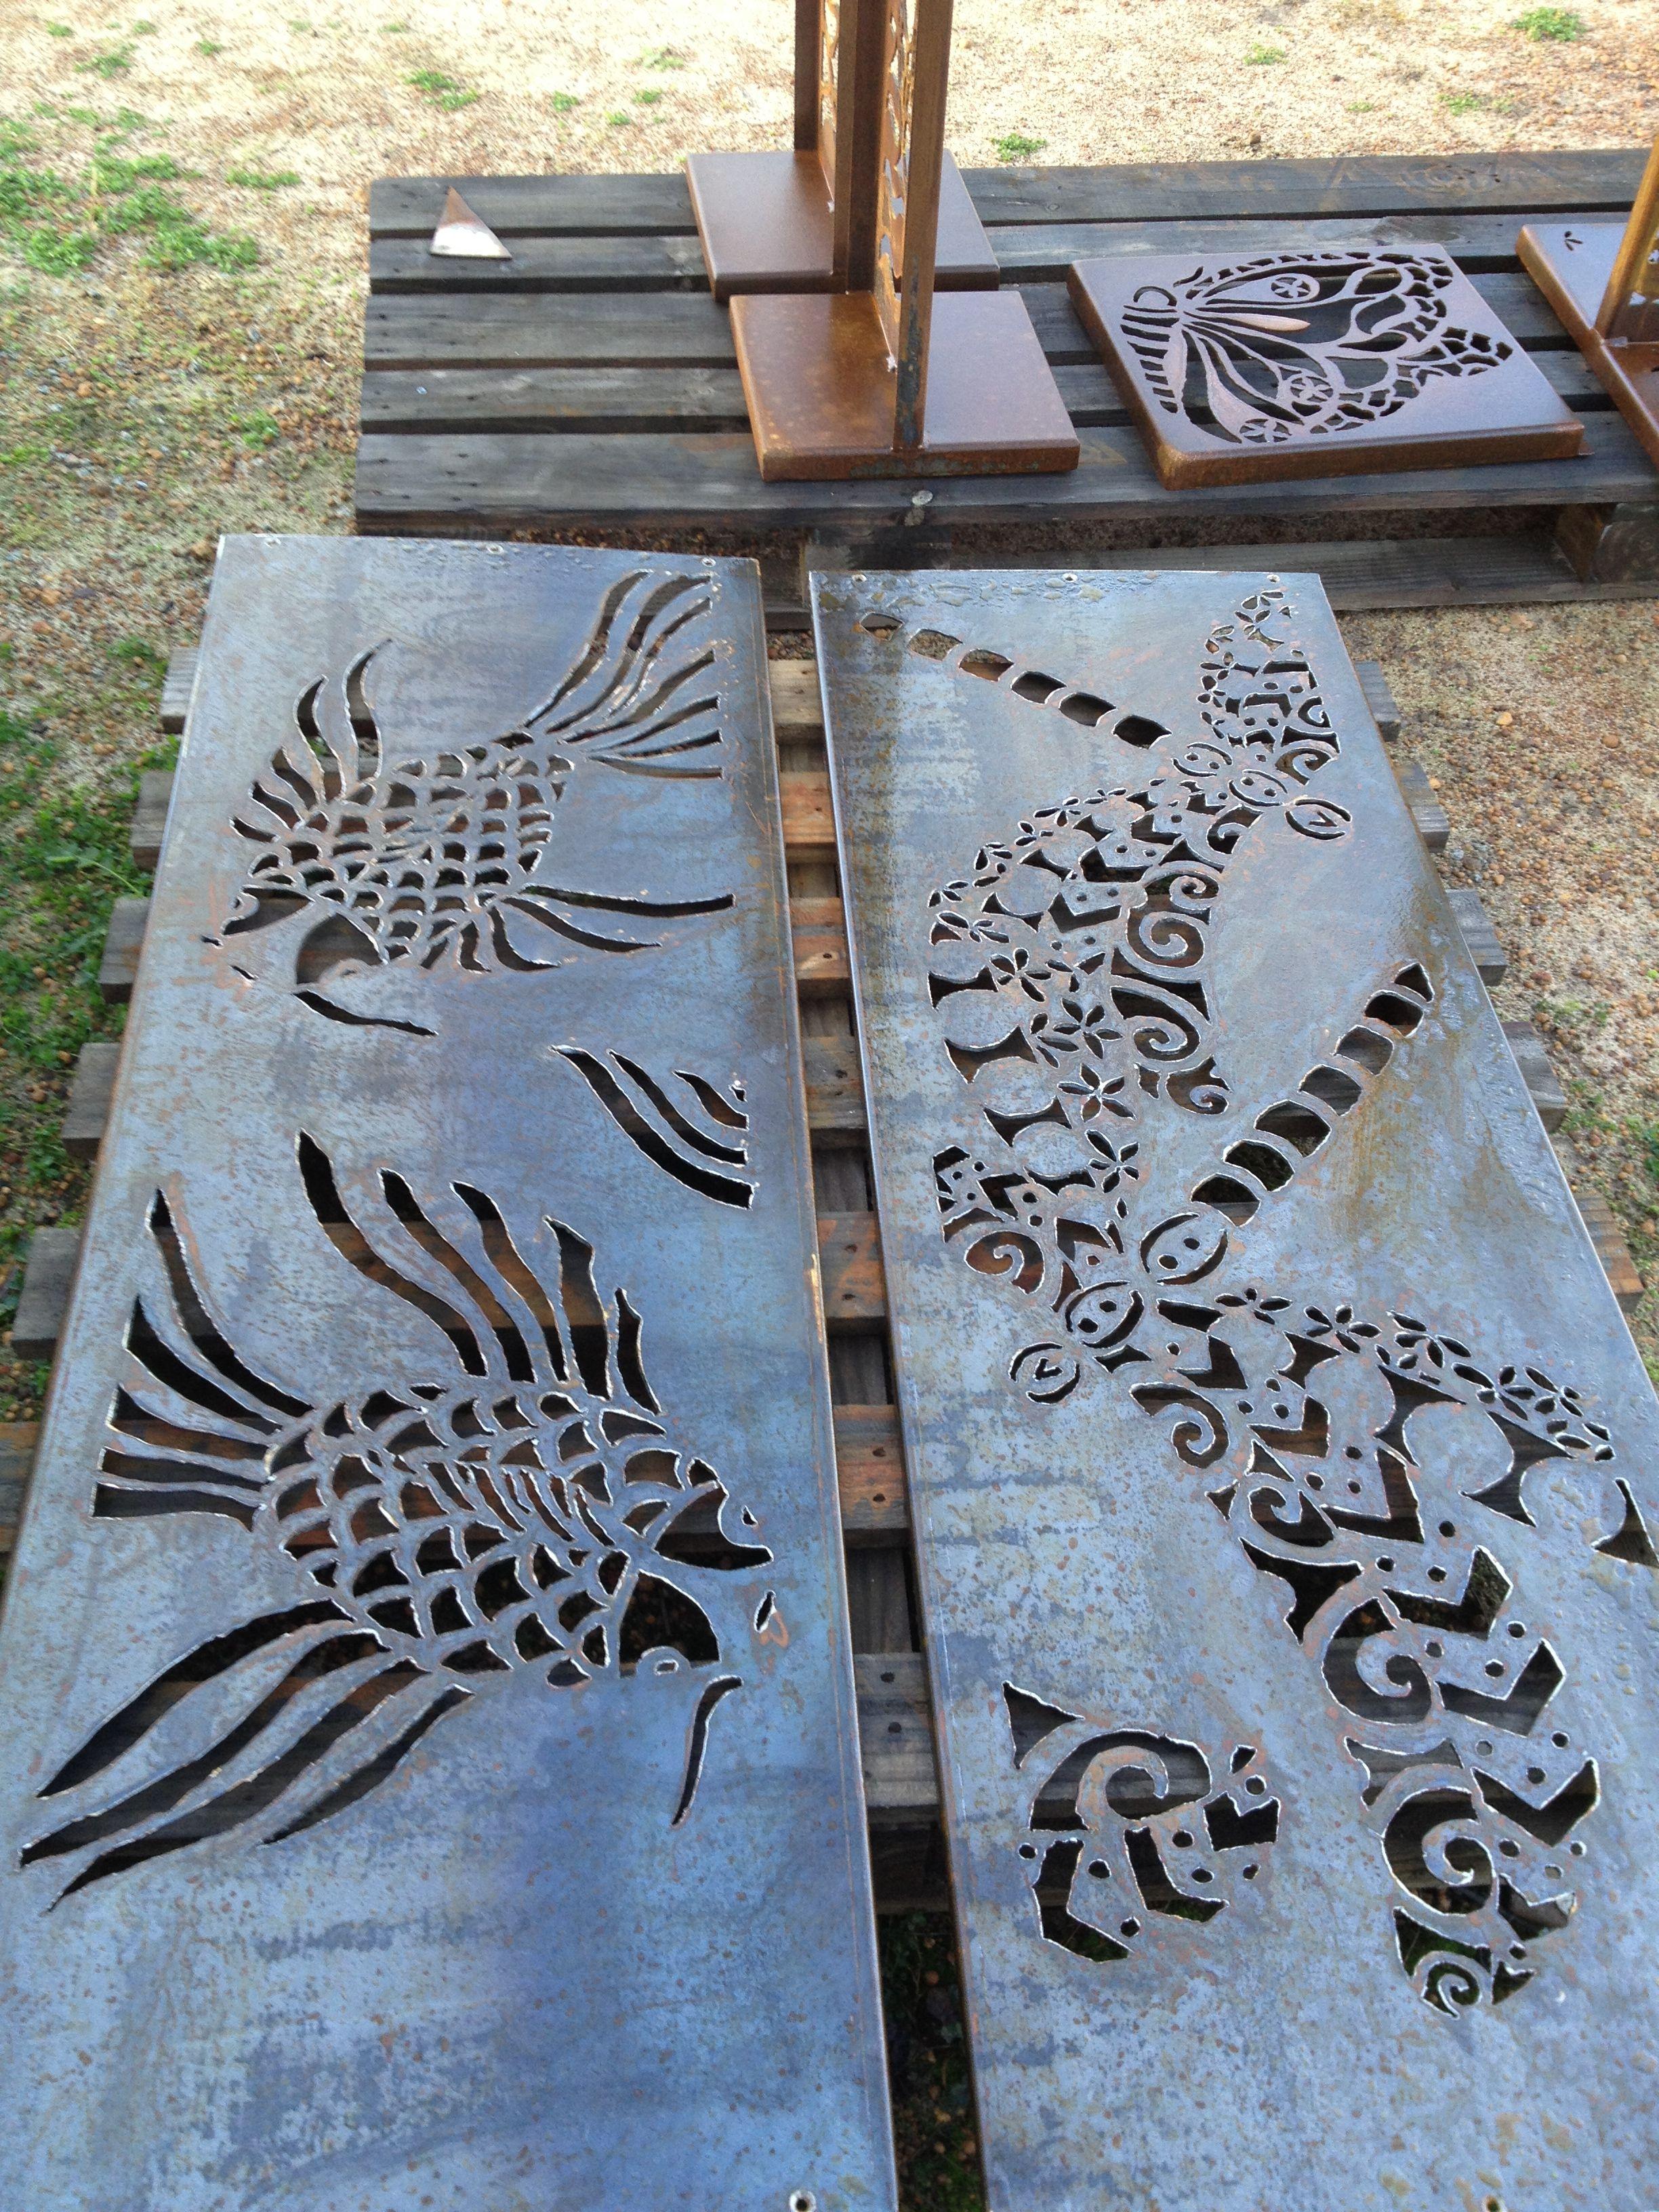 Pin By Brian Hammel On Metal Art By Inge Plasma Cutter Art Metal Art Plasma Cutter